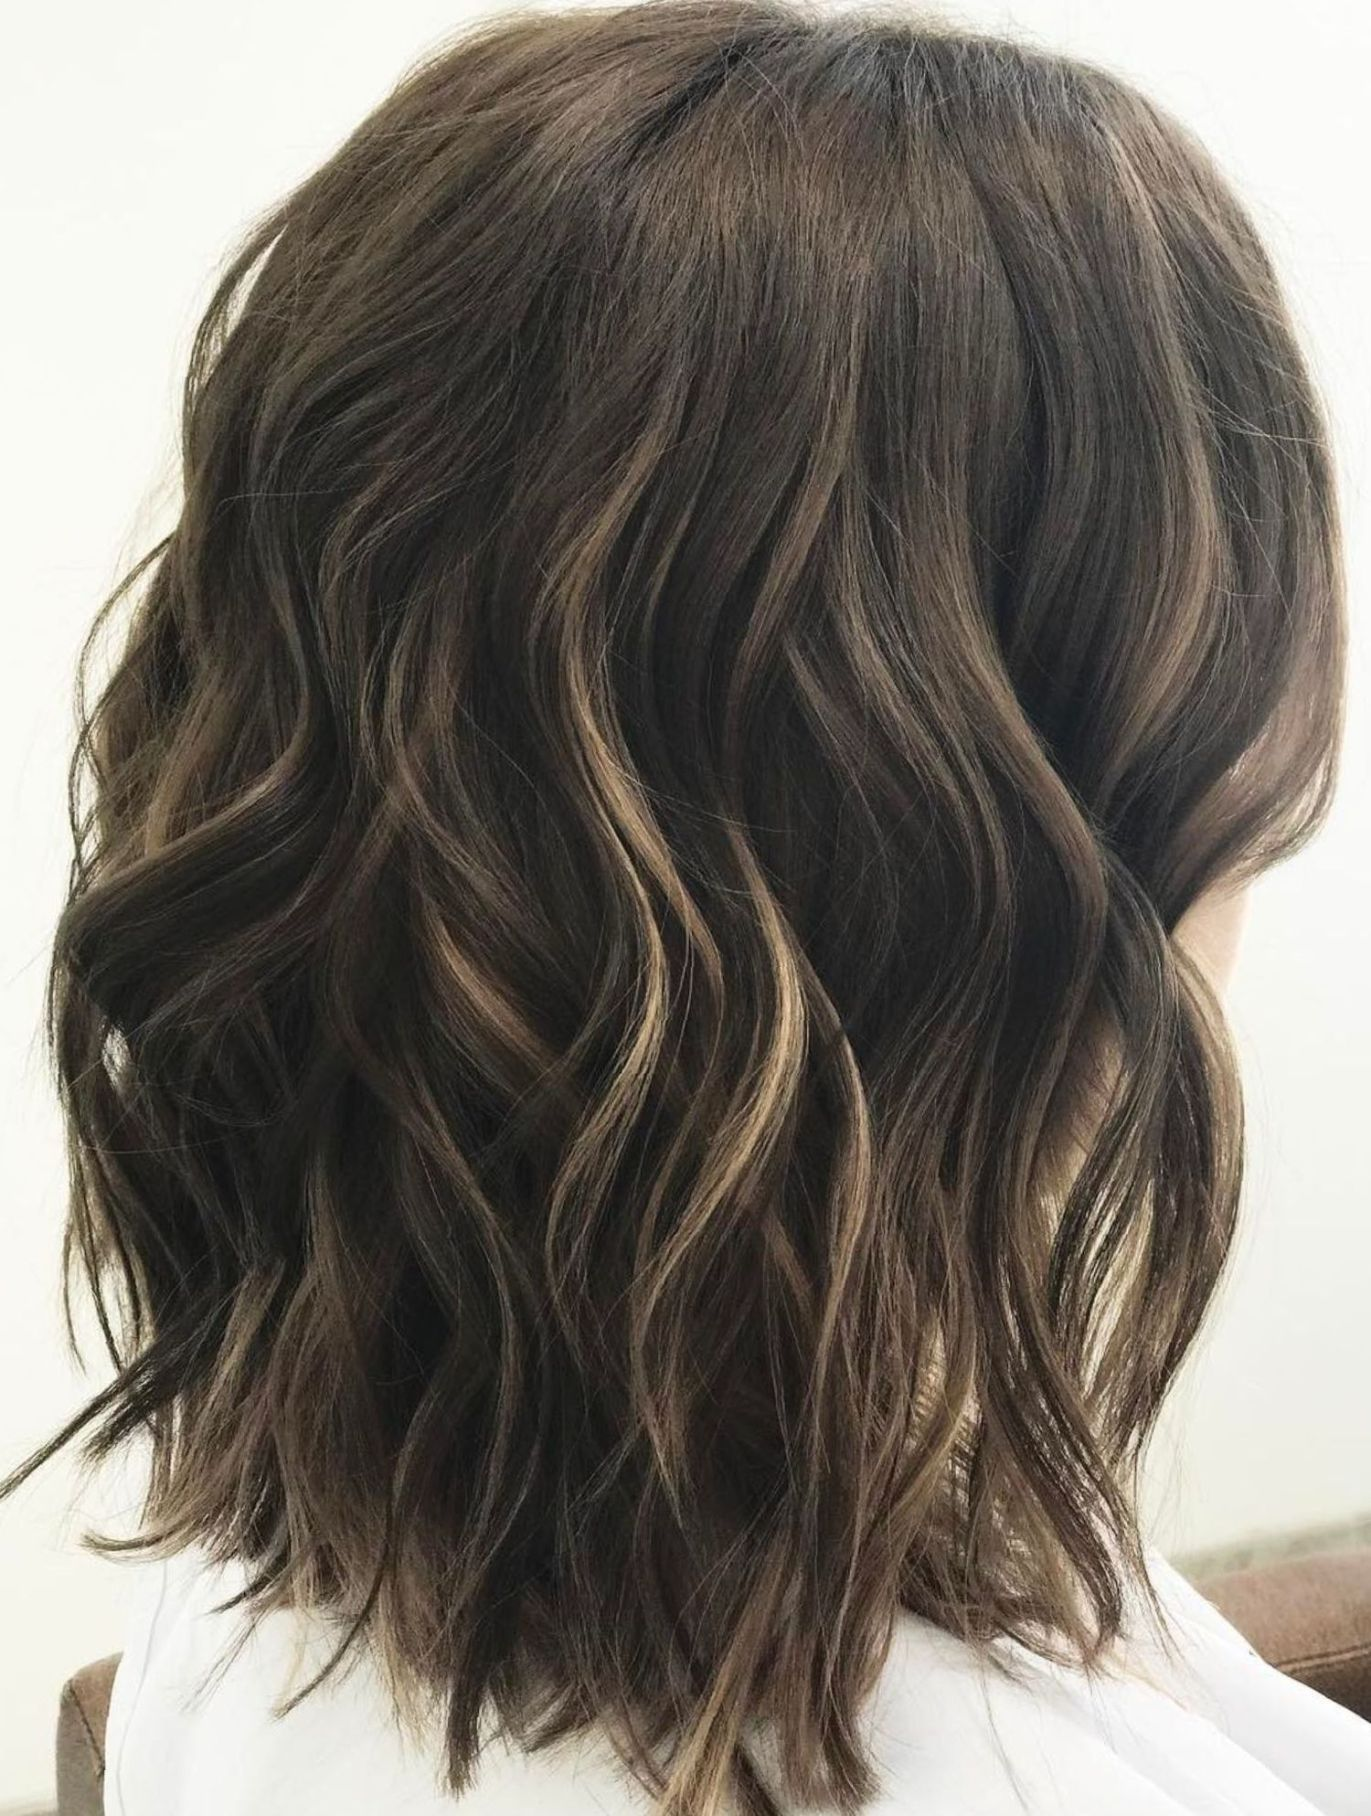 Medium Wavy Brunette Hairstyle Haircut For Thick Hair Curls For Medium Length Hair Wavy Hairstyles Medium